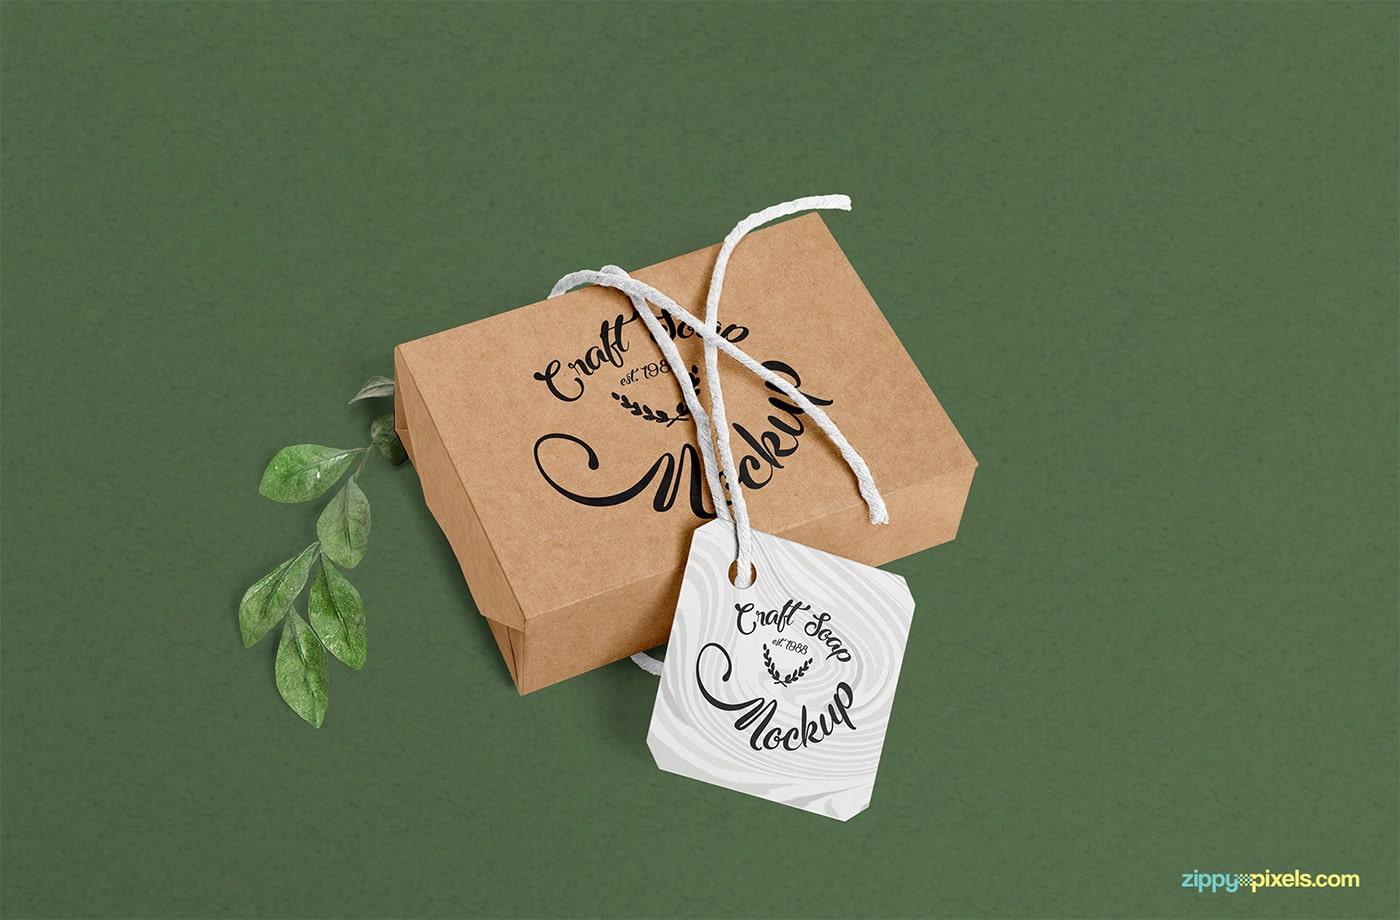 Craft Box Soap